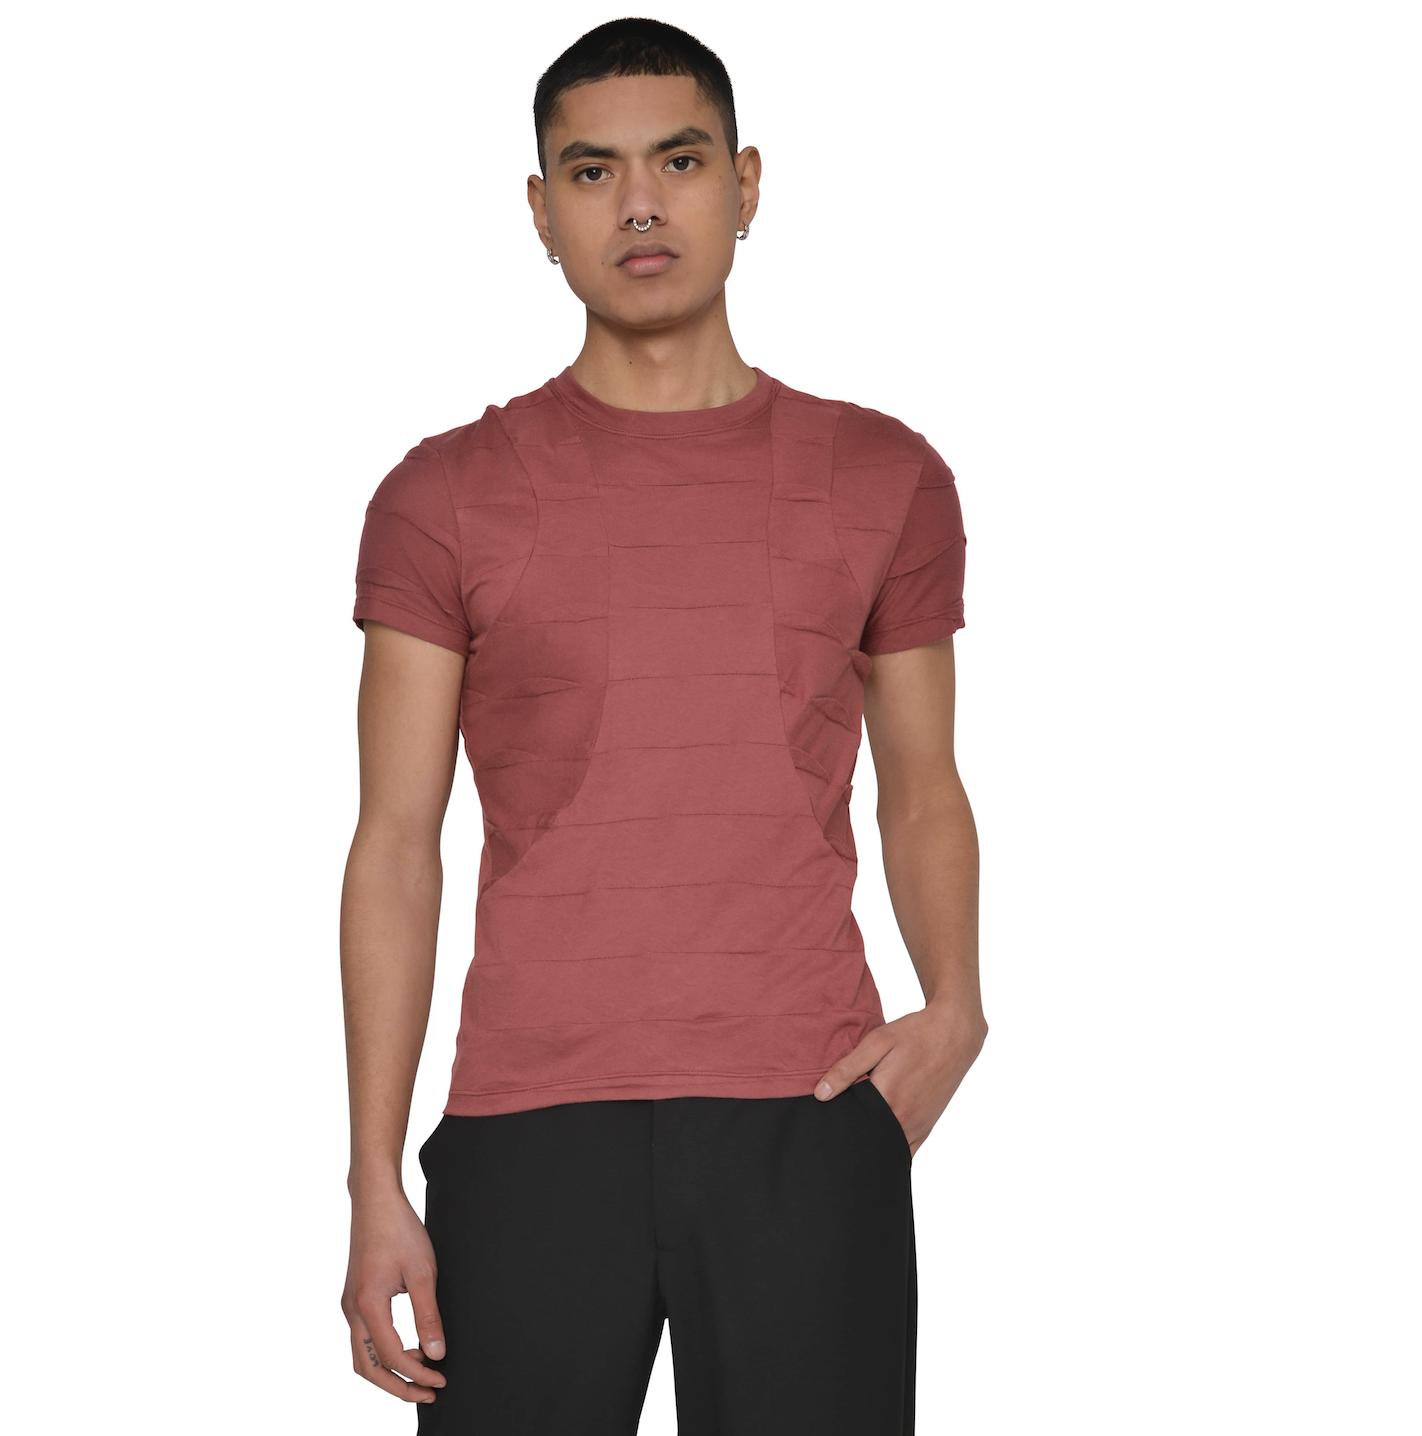 T-Shirt BÚFALO 0